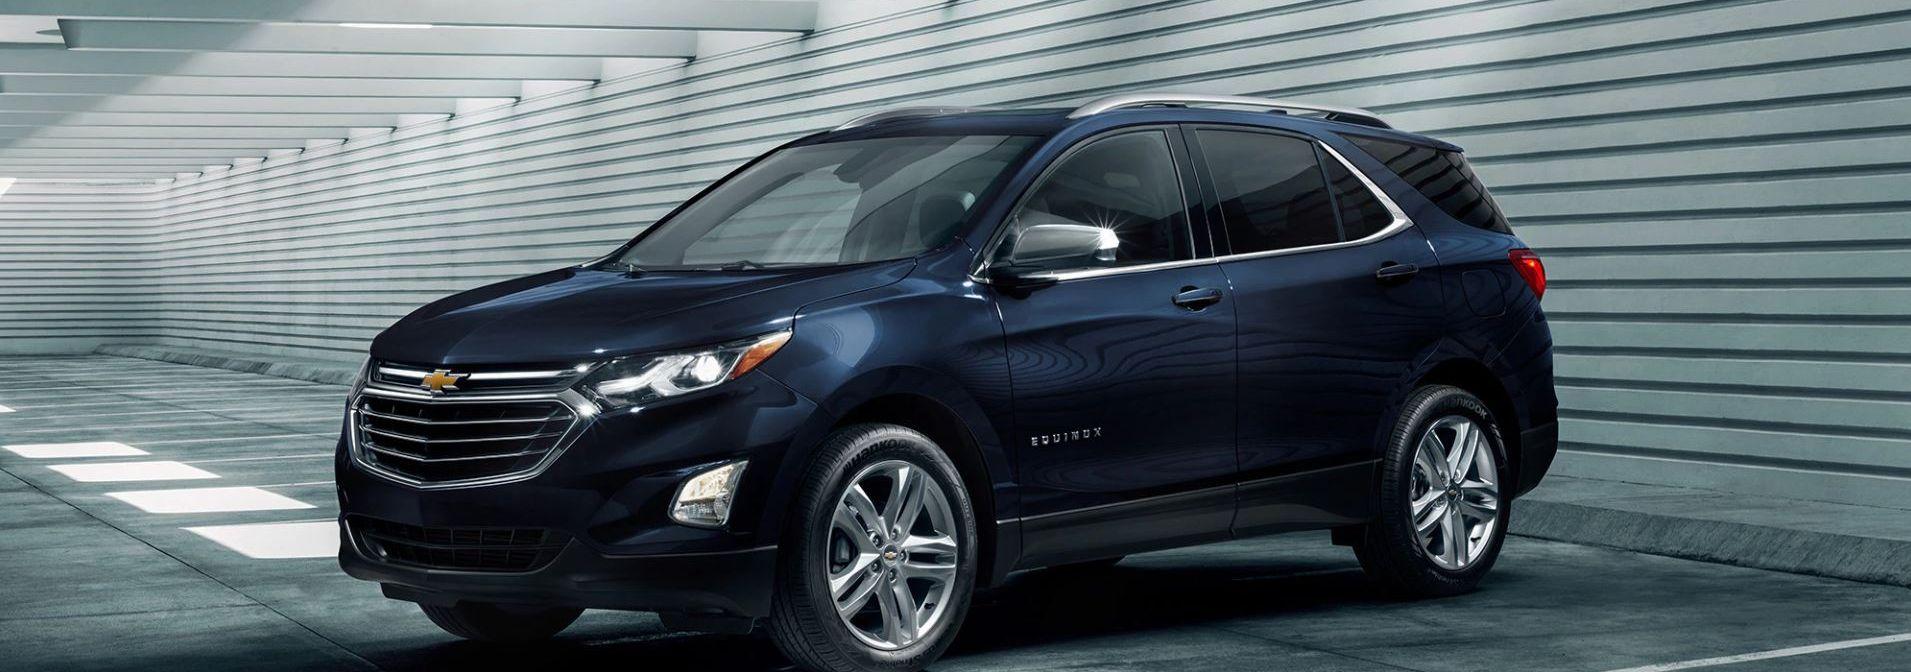 2020 Chevrolet Equinox For Sale Near Glenpool Ok